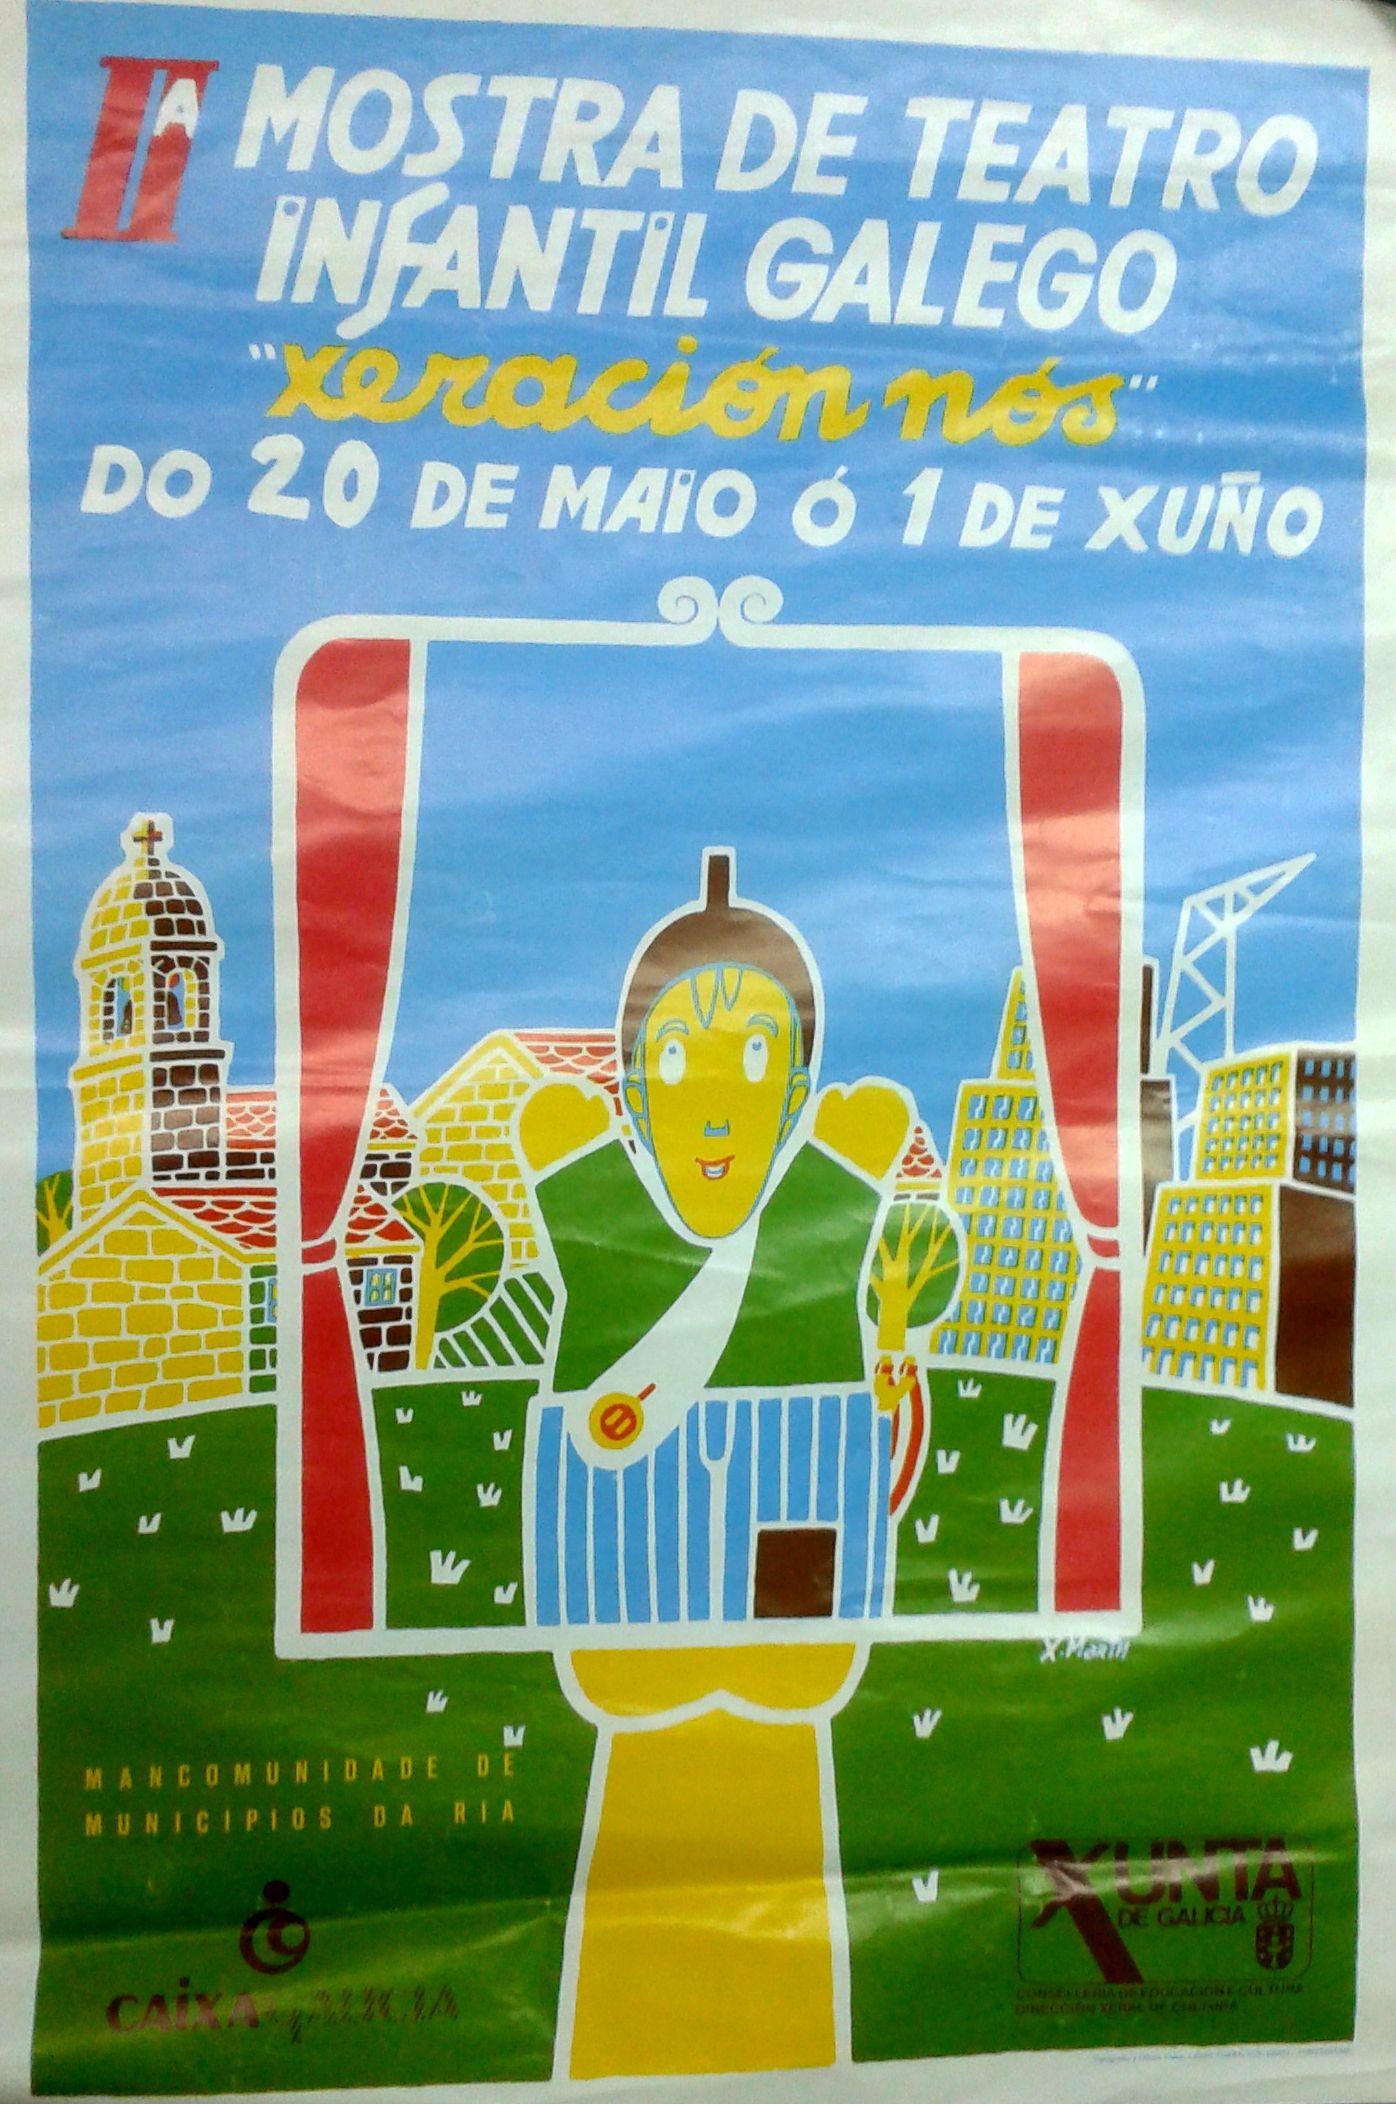 II Mostra de Teatro Infantil Galego. 1985. Xaquín Marín